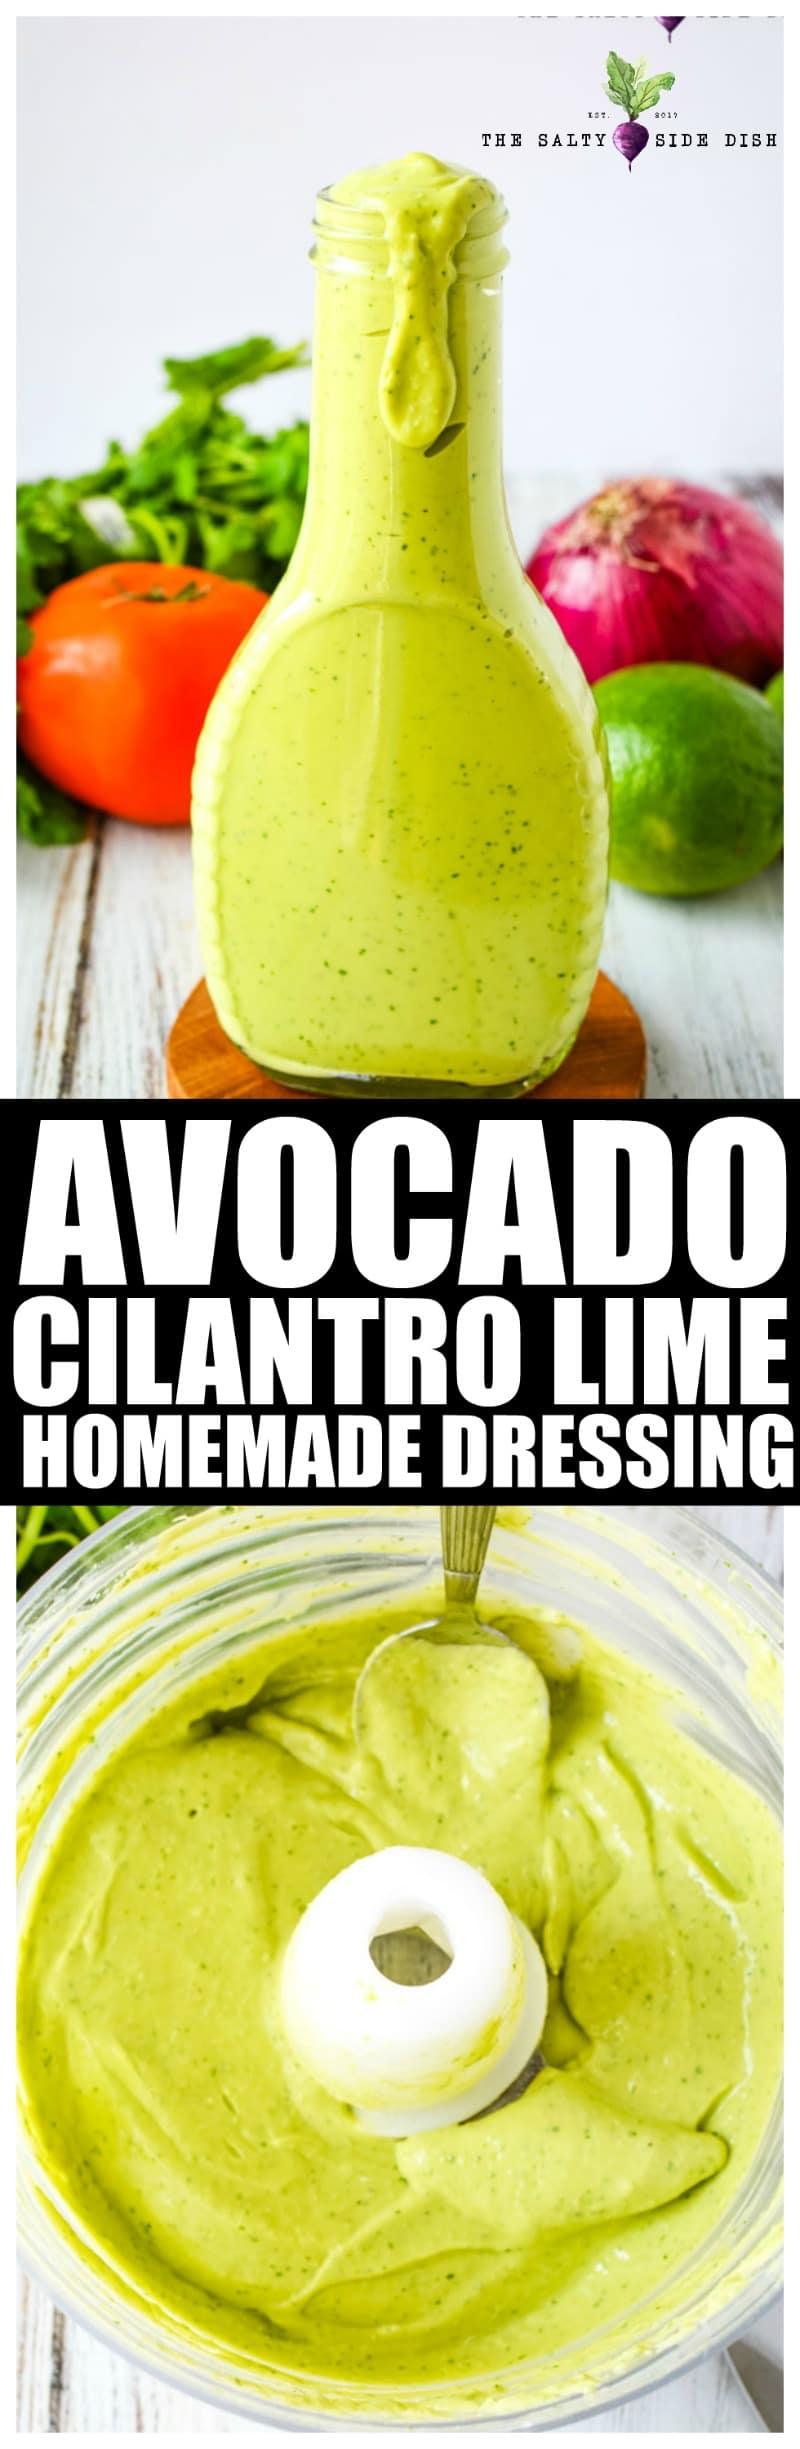 Avocado Cilantro Dressing with lime | Easy Homemade Avocado Dressing #dressing #salad #sauce #dip #avocado